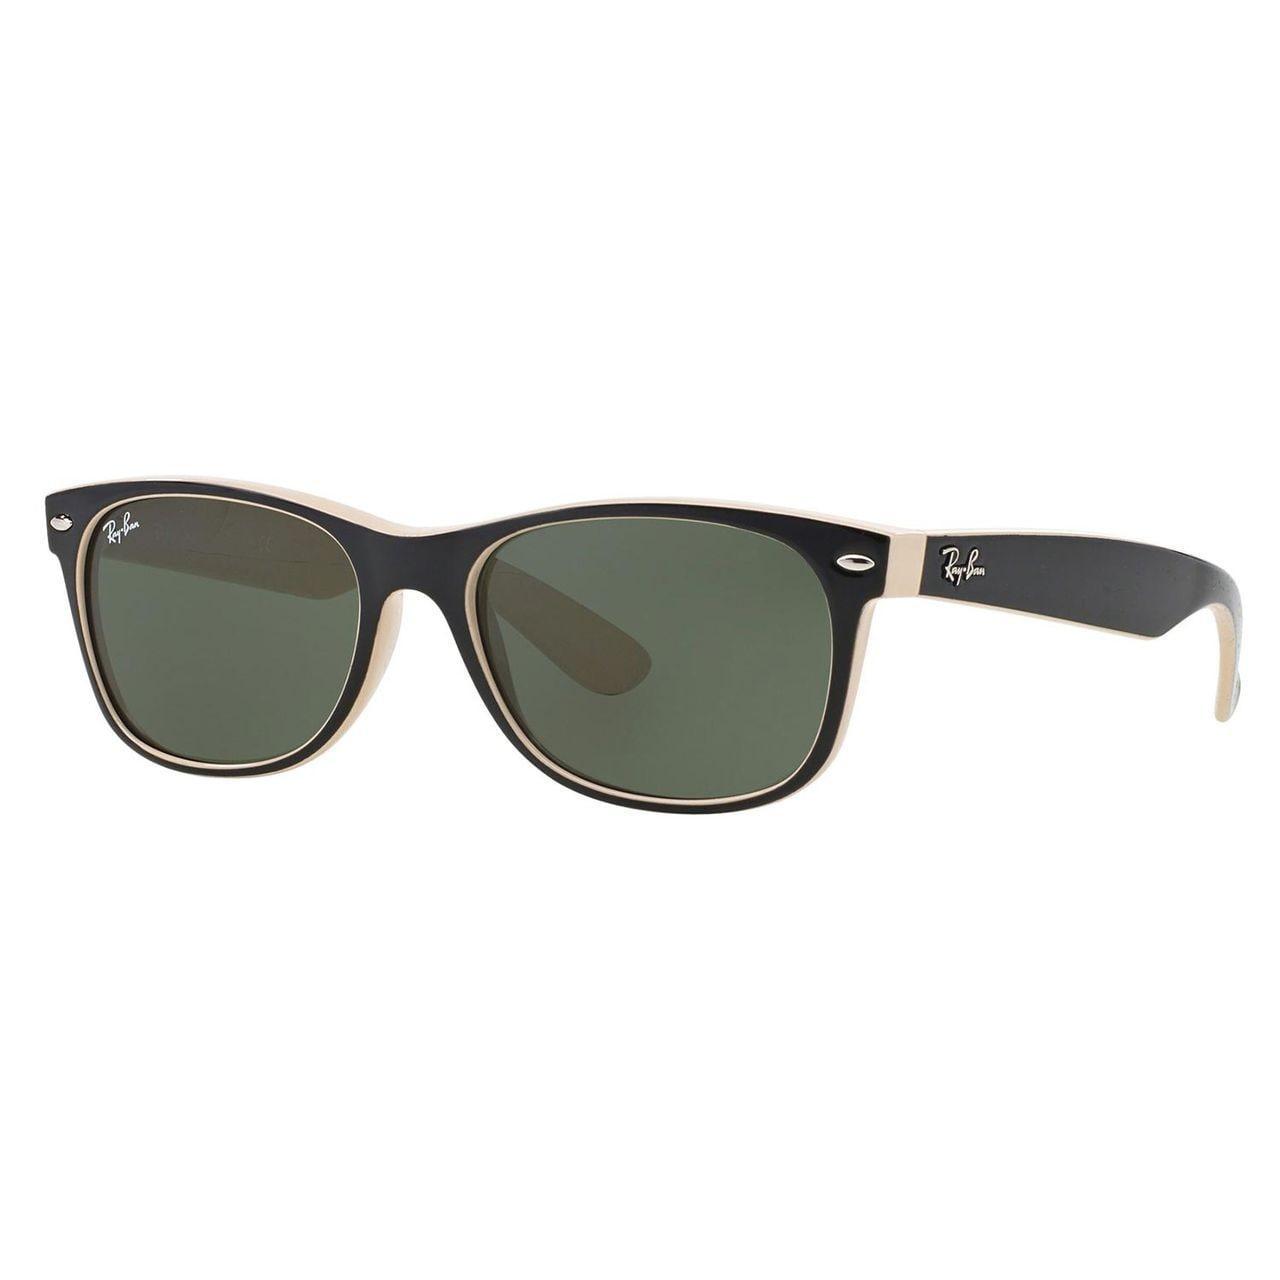 e133233754 Shop Ray-Ban Men s Black on Beige Wayfarer Sunglasses (55 mm) - Free ...